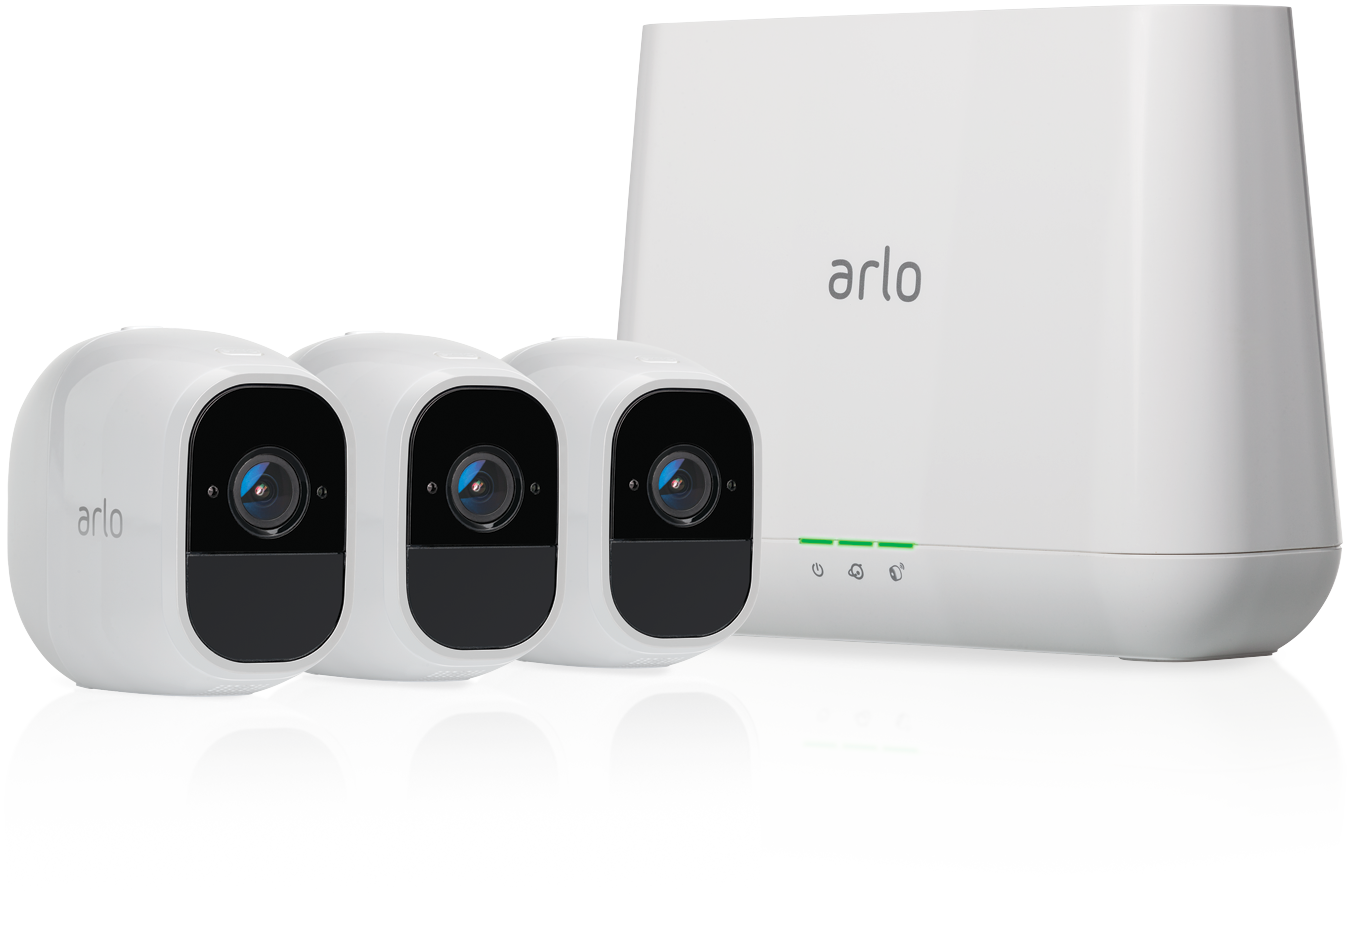 Netgear Arlo Pro 2 Smart Security System with 3 Cameras VMS4330P-100EUS